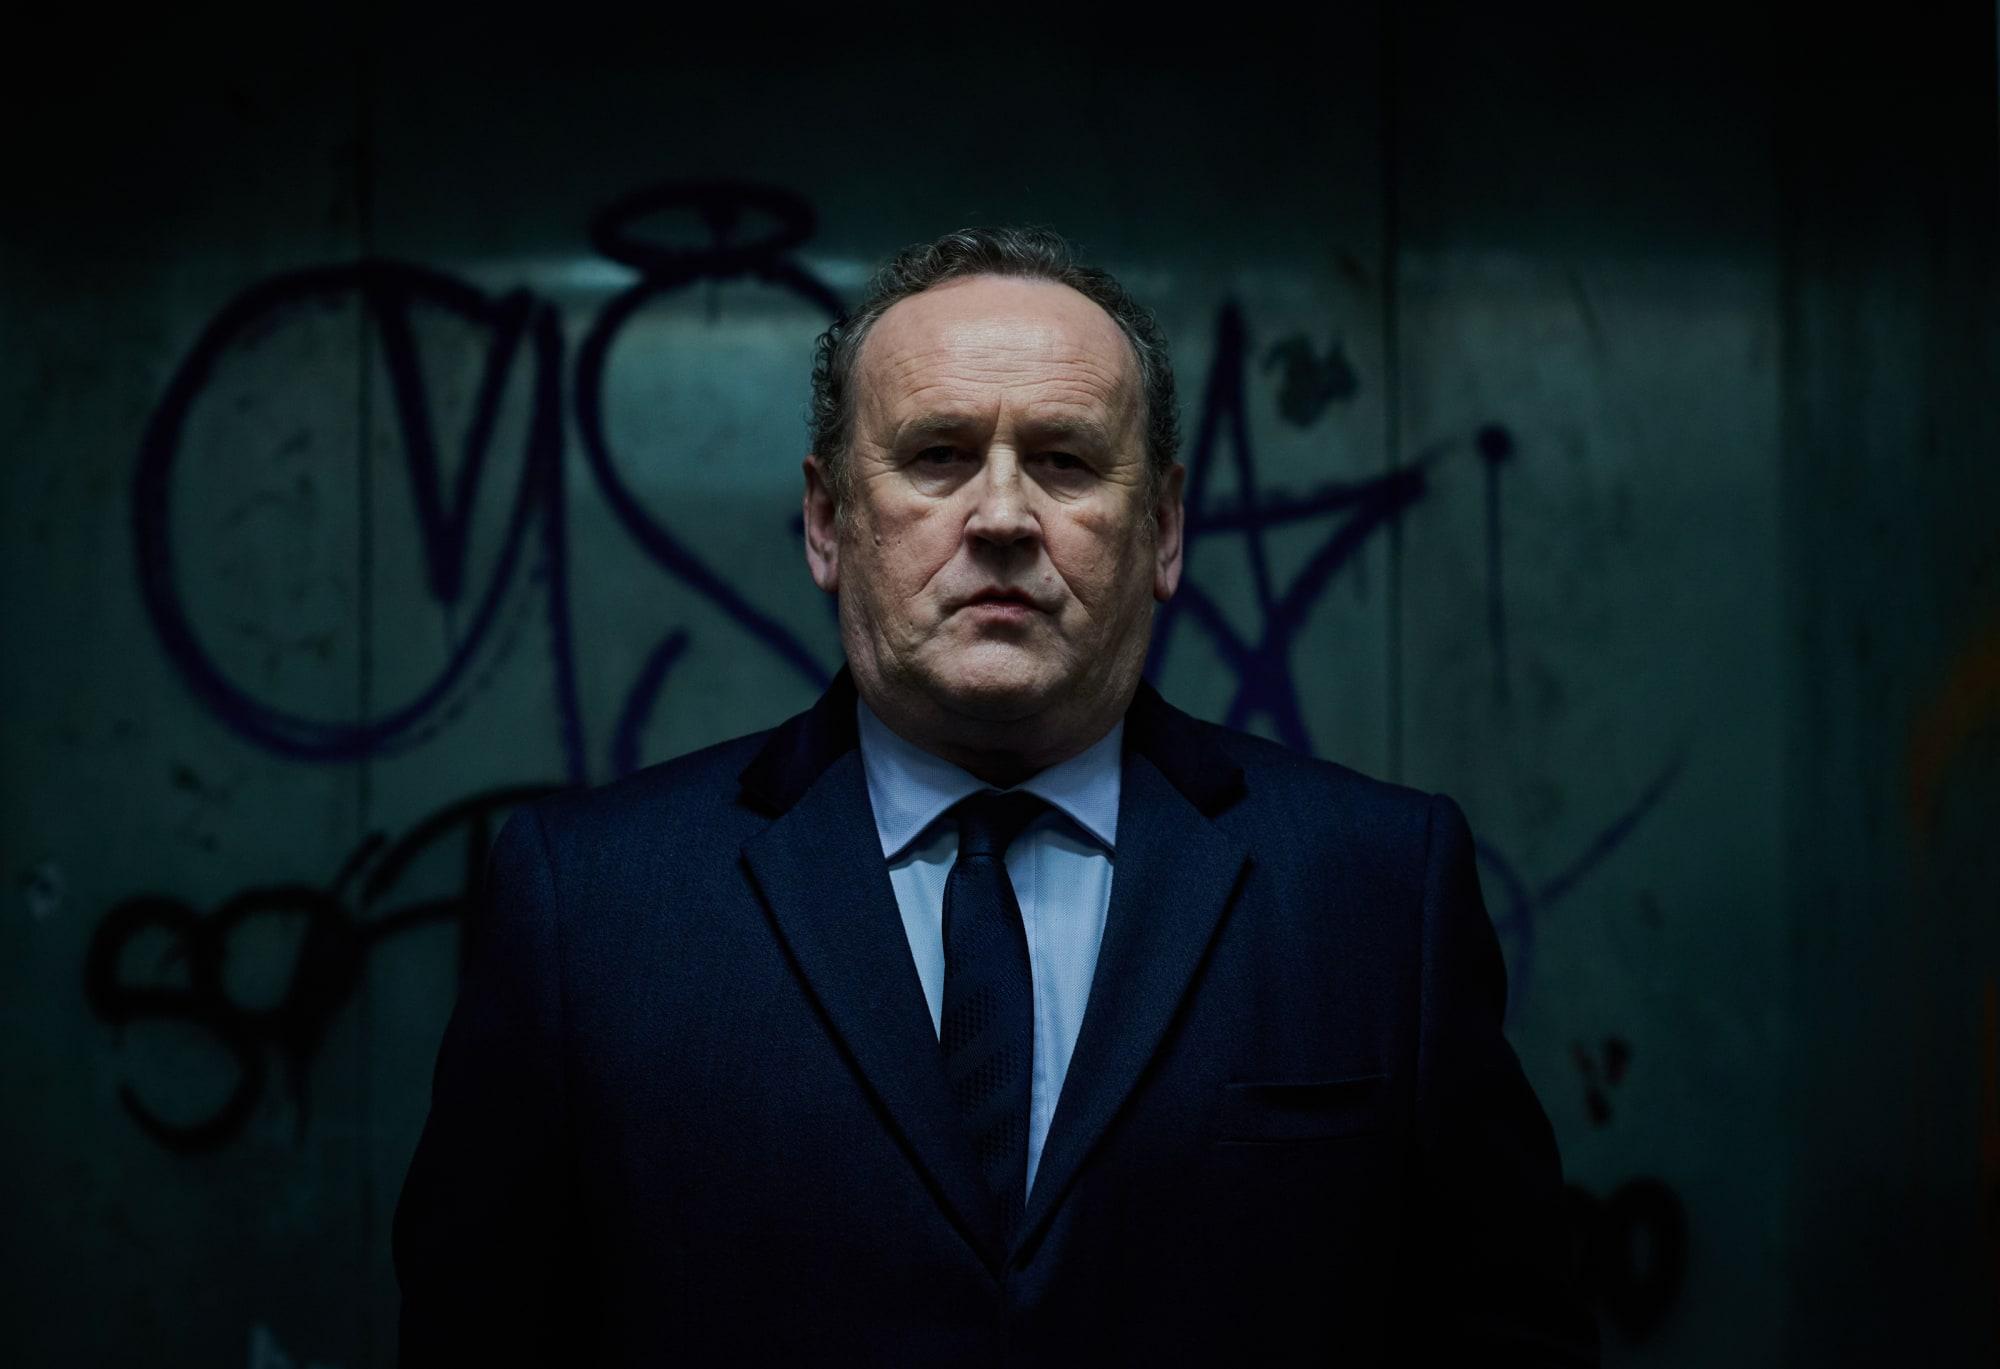 Gangs of London Season 1, Episode 1 recap: Finn Wallace's death changes everything